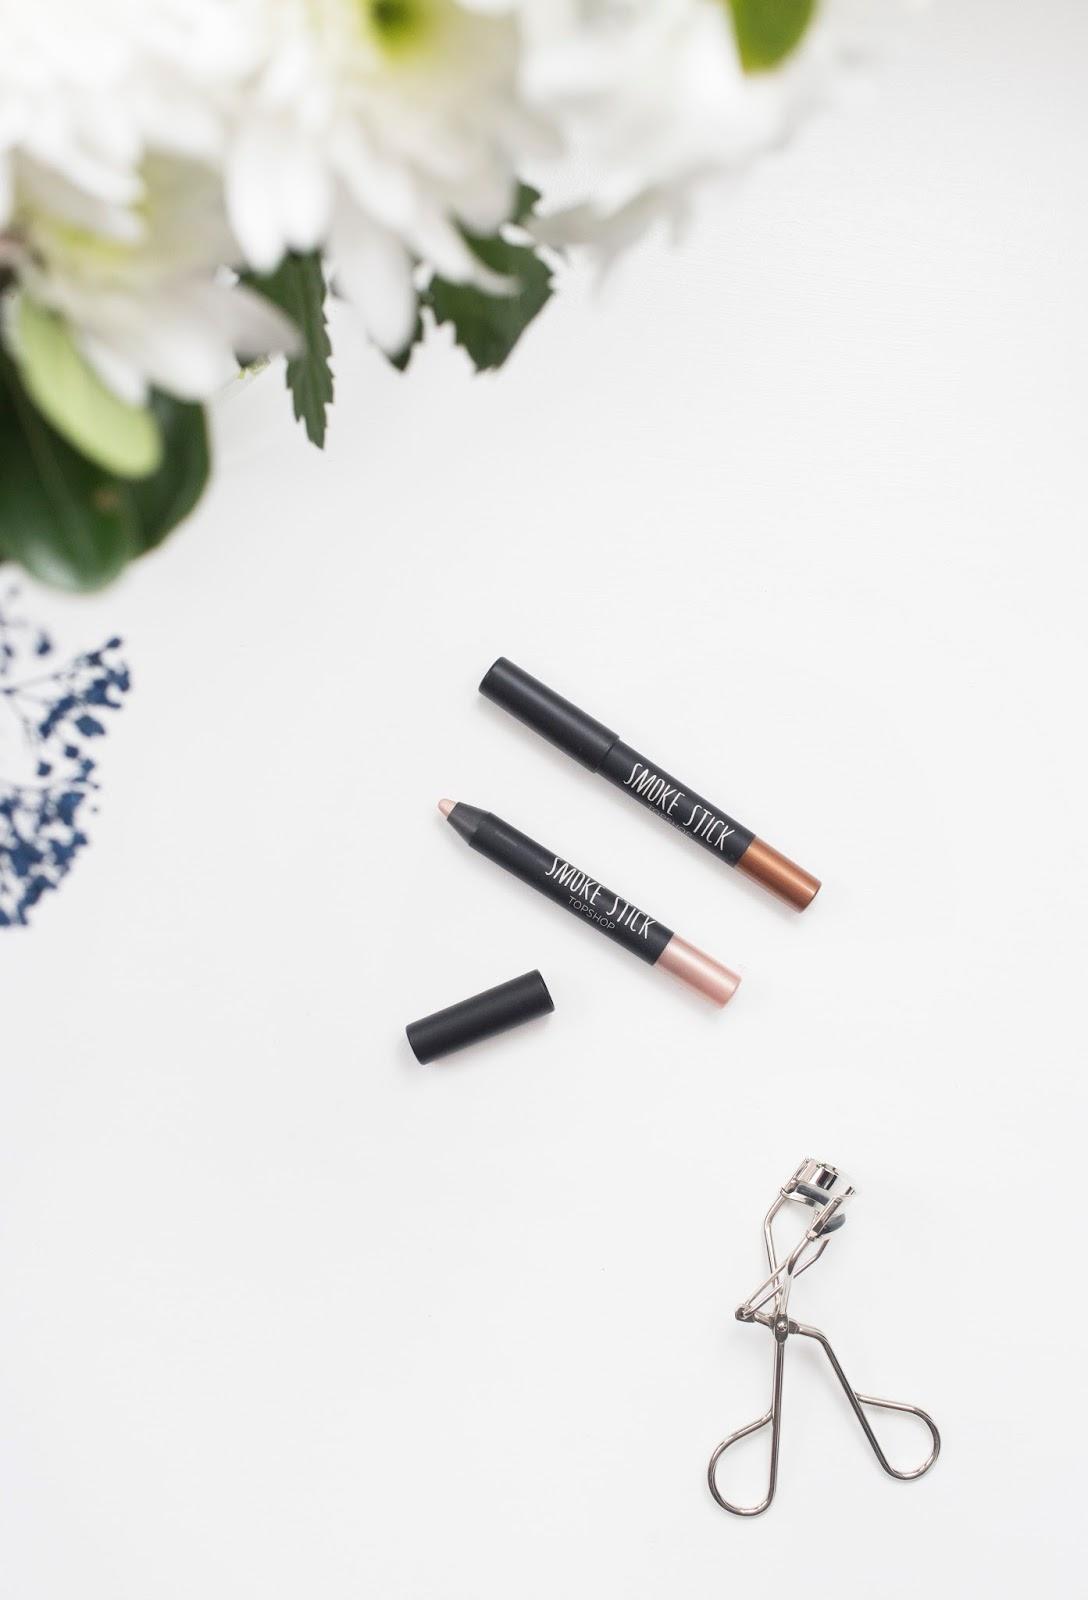 Topshop Make-up | Smoke Sticks